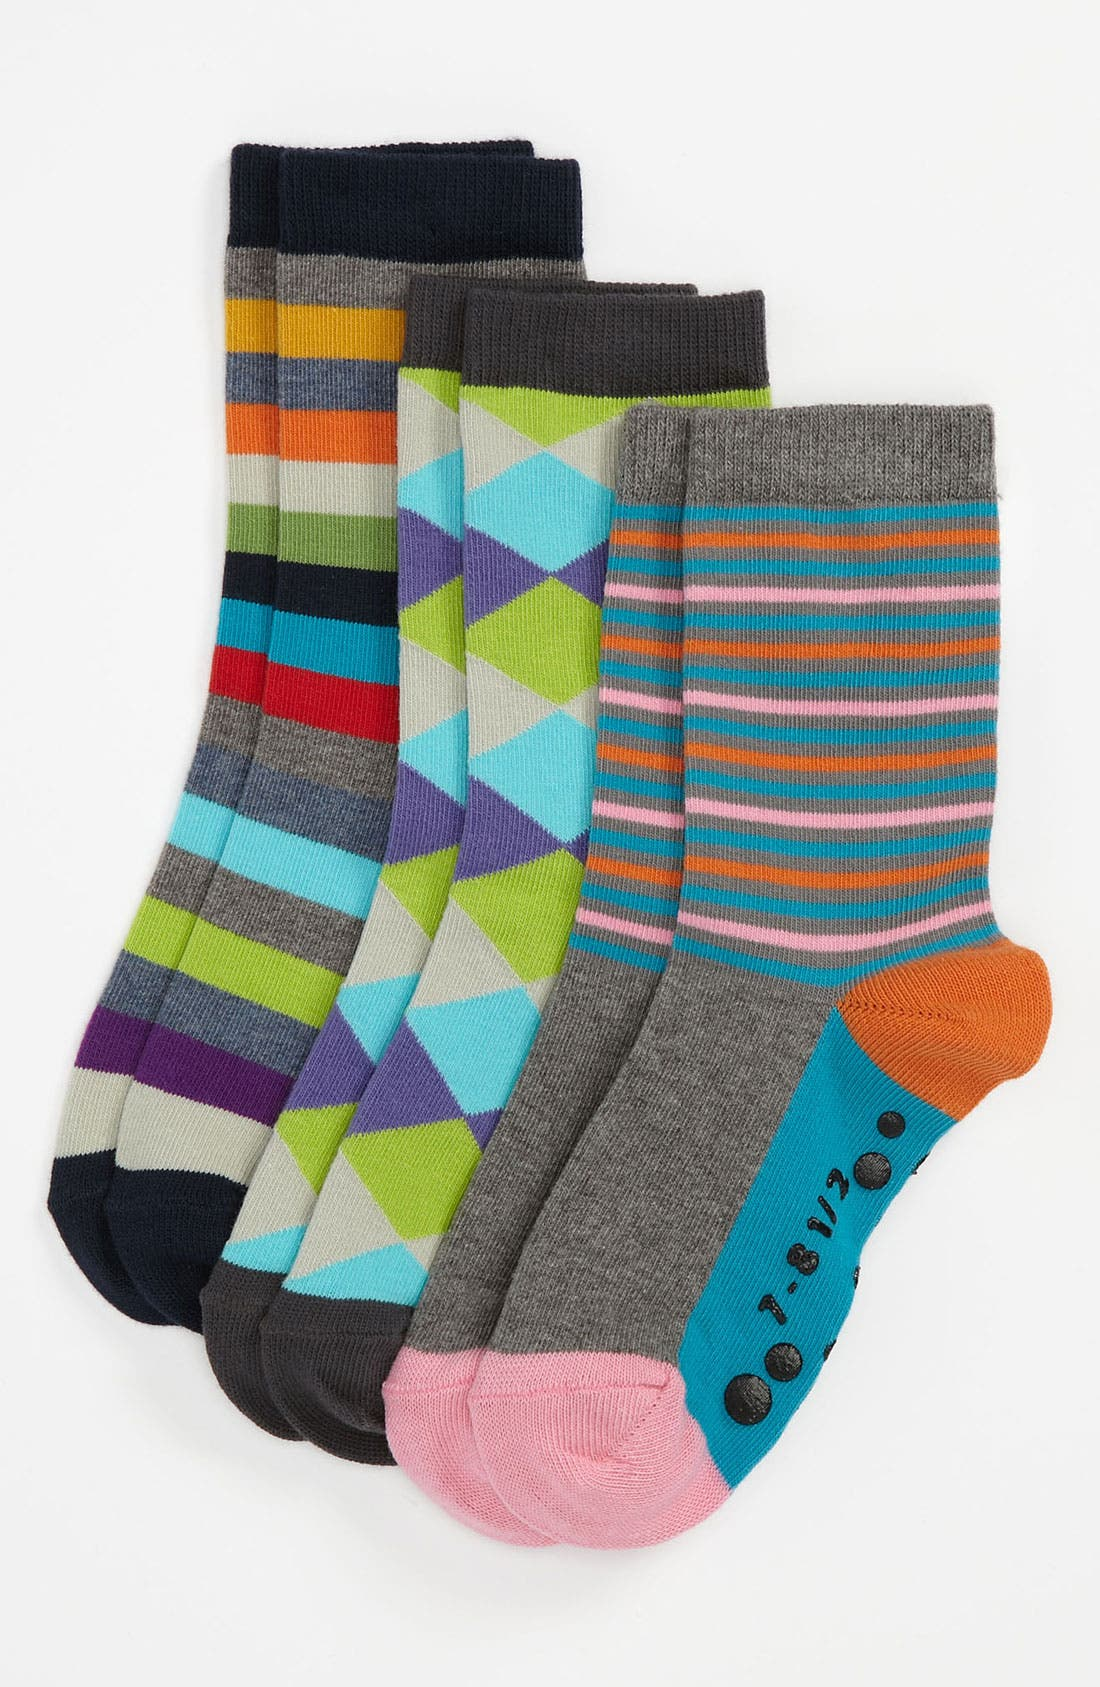 Alternate Image 1 Selected - Nordstrom 'Get Happy' Crew Socks (3-Pack) (Kids)